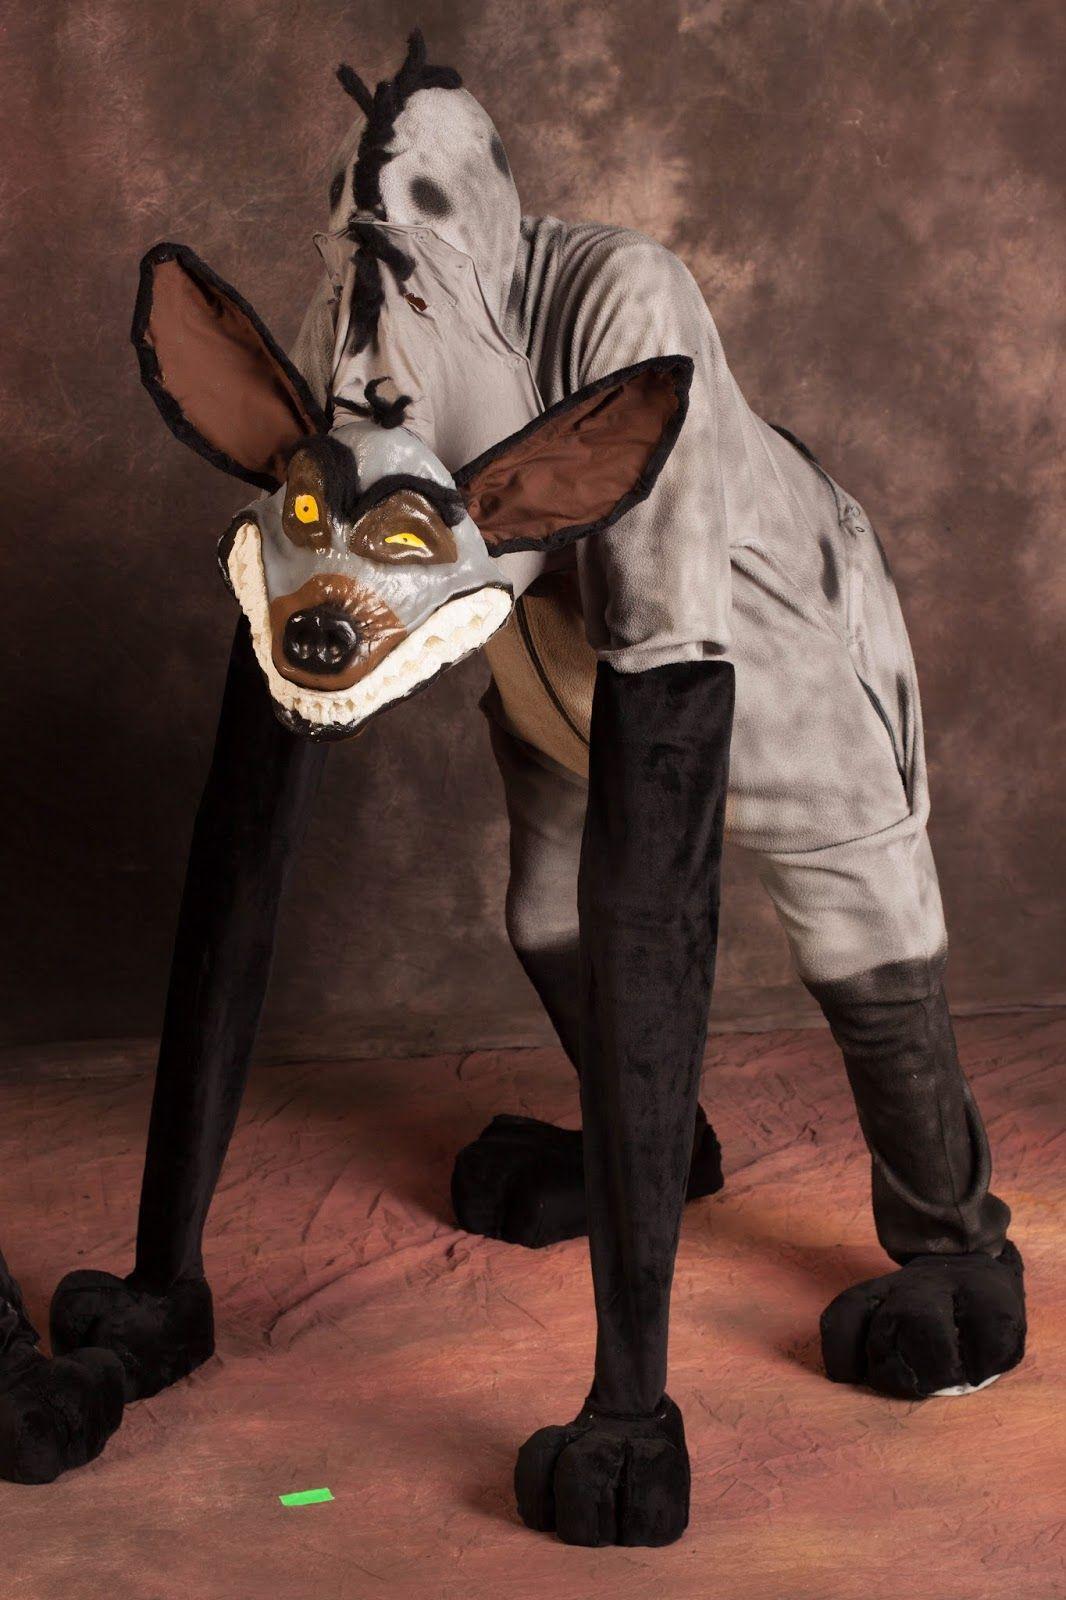 Lion king broadway hyenas - photo#10